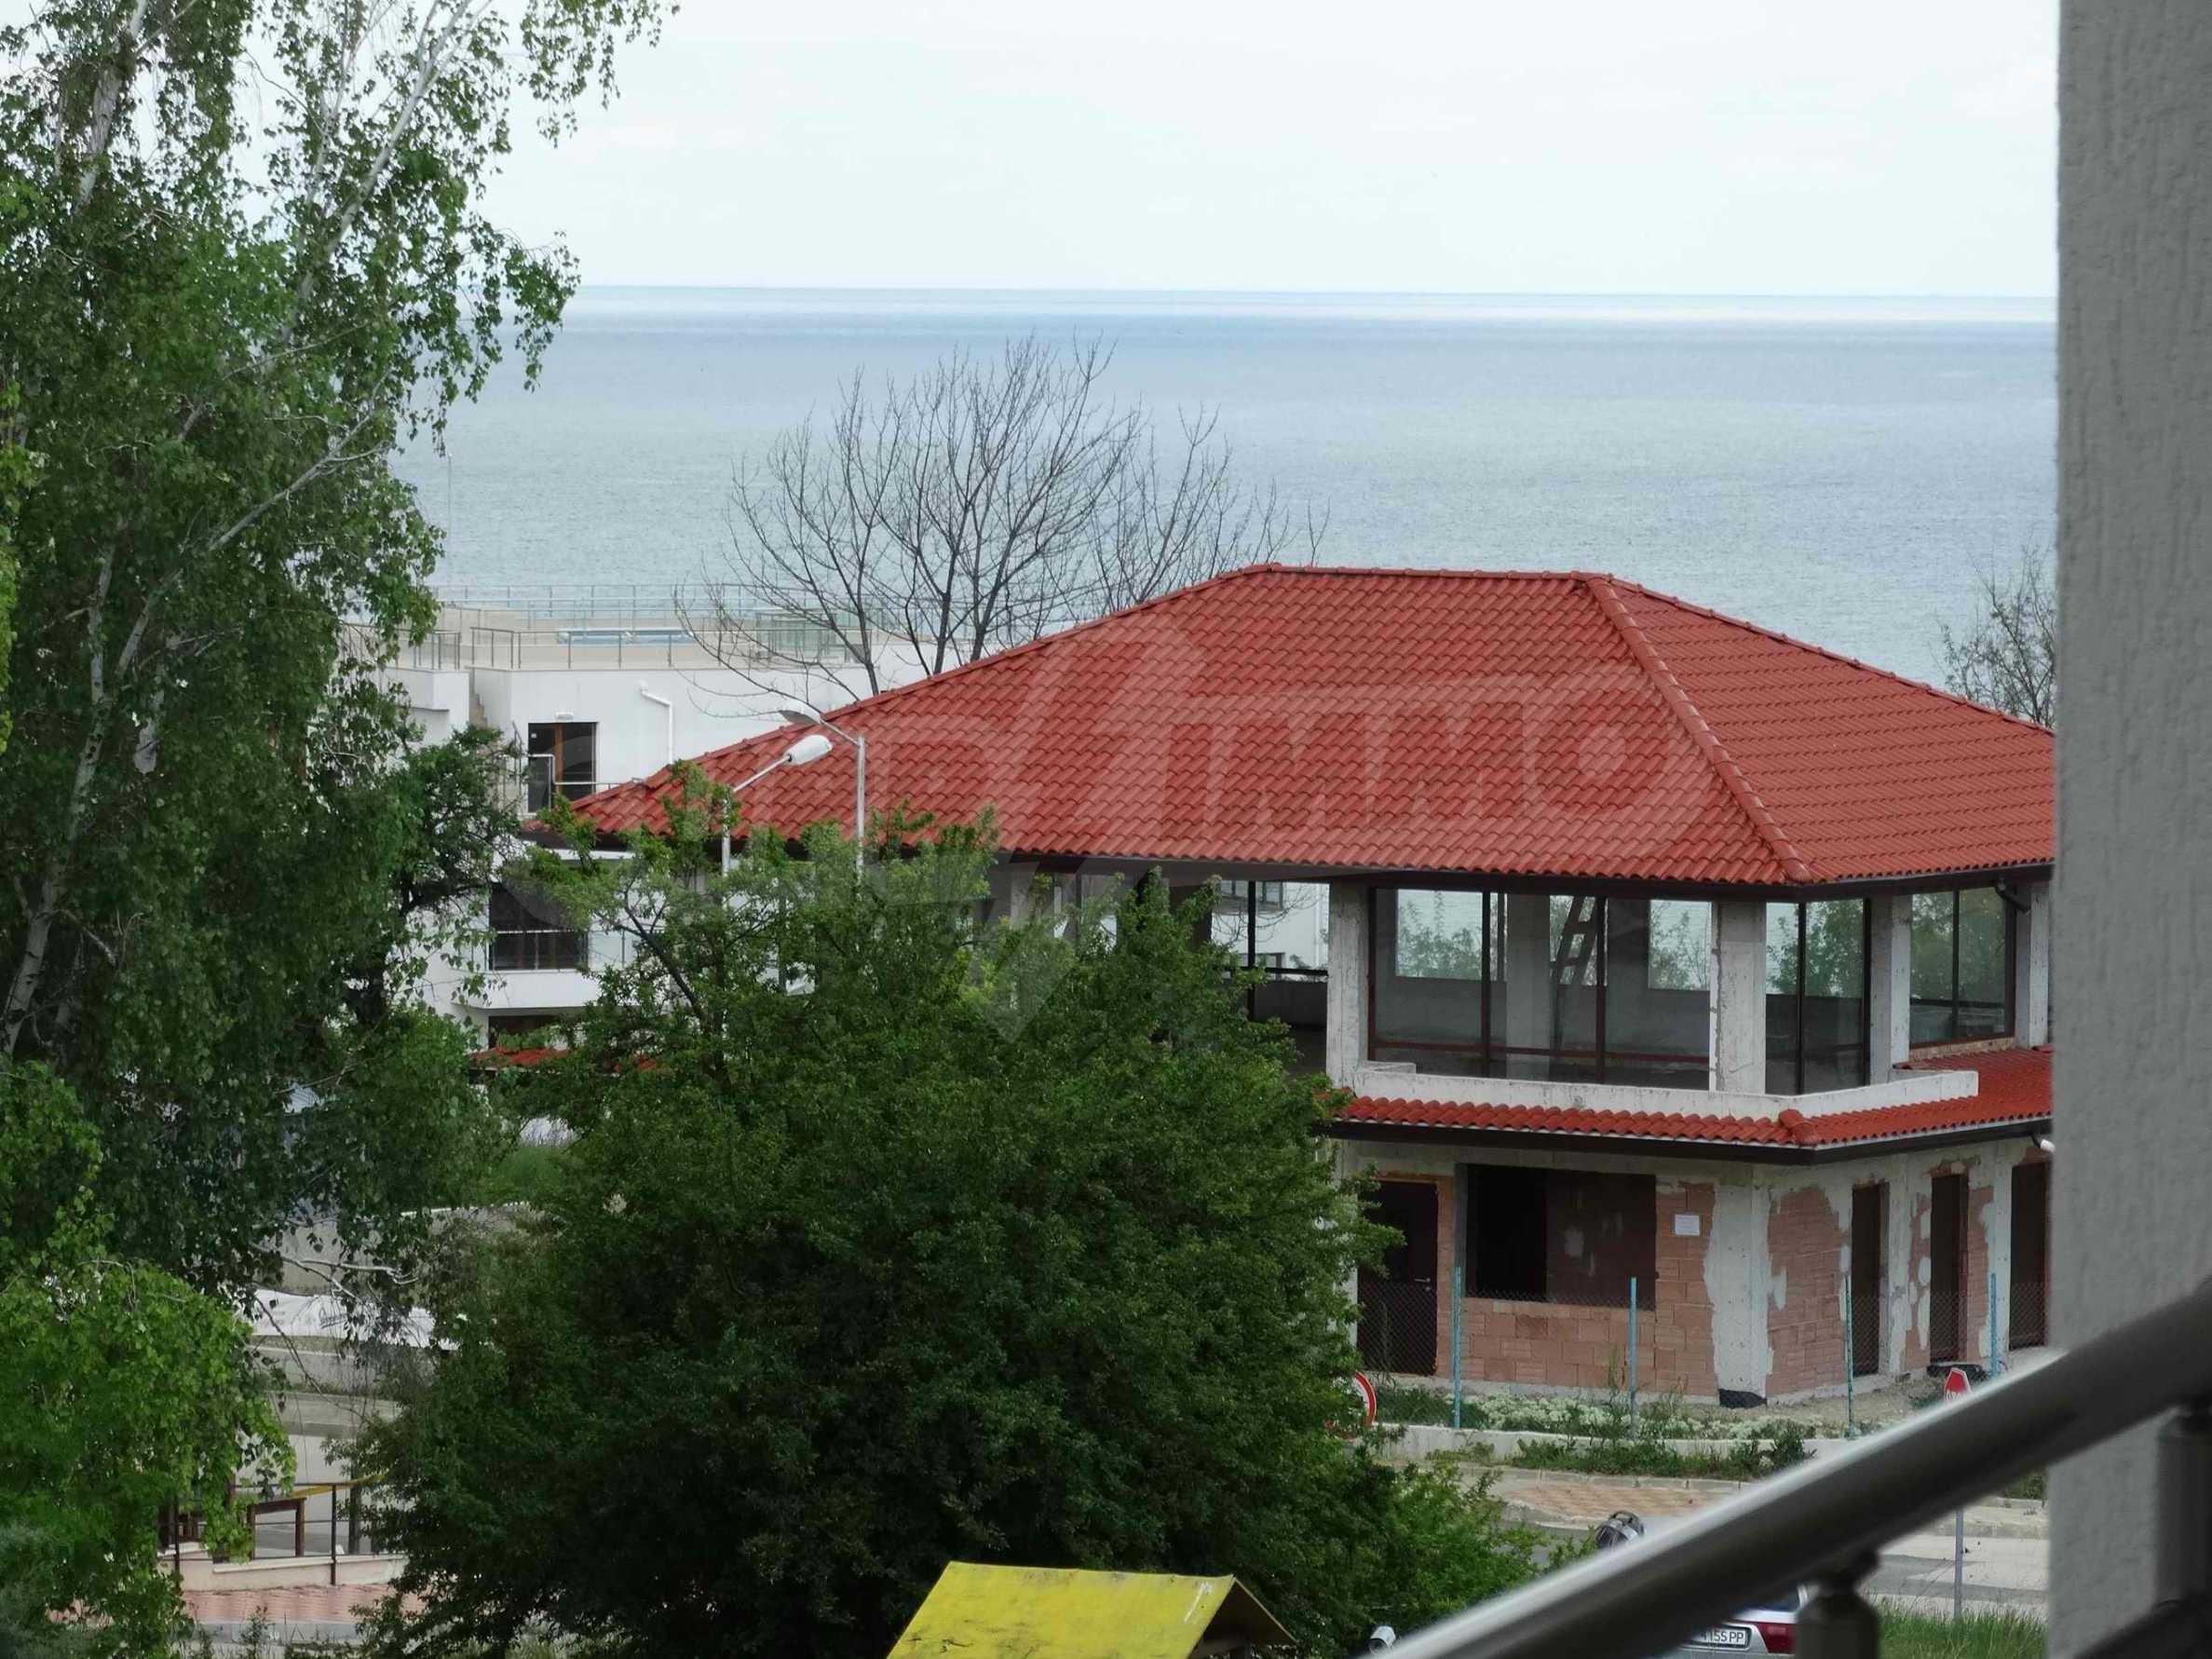 Тристаен апартамент близо до плажа в Бяла 4